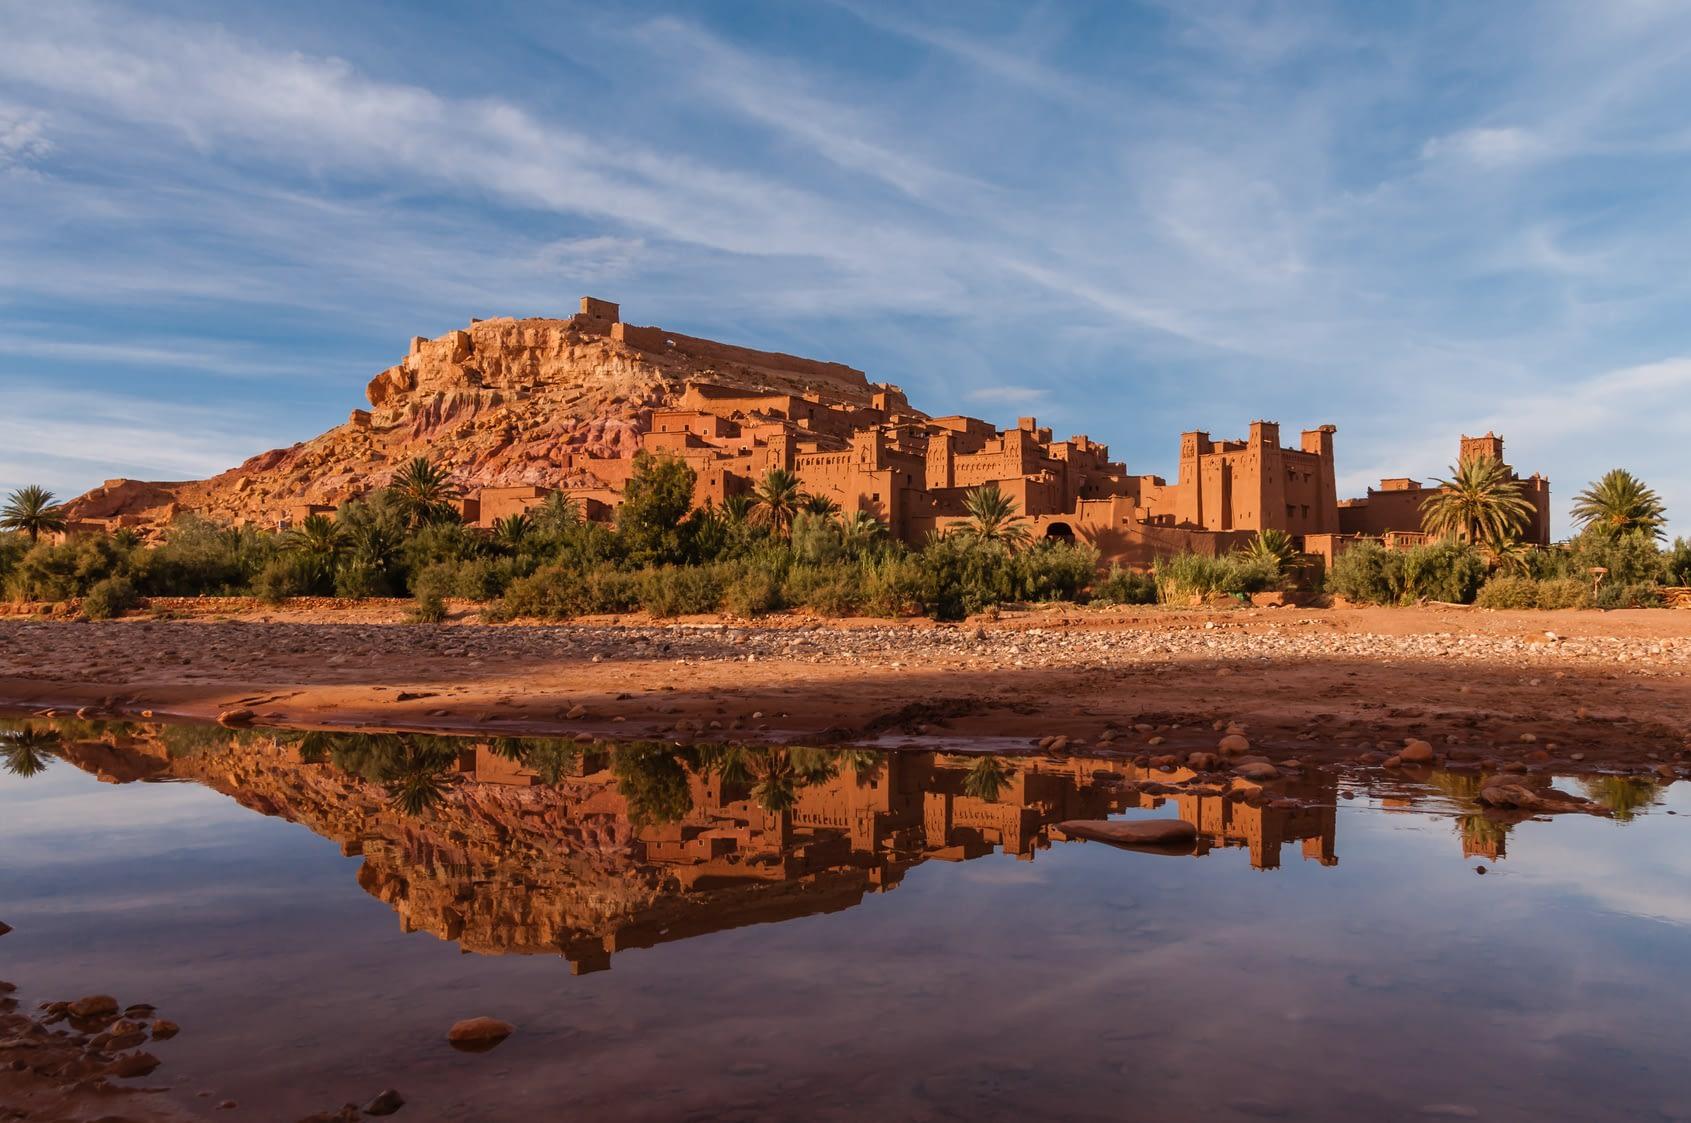 Aid Ben Haddou, Morocco holiday